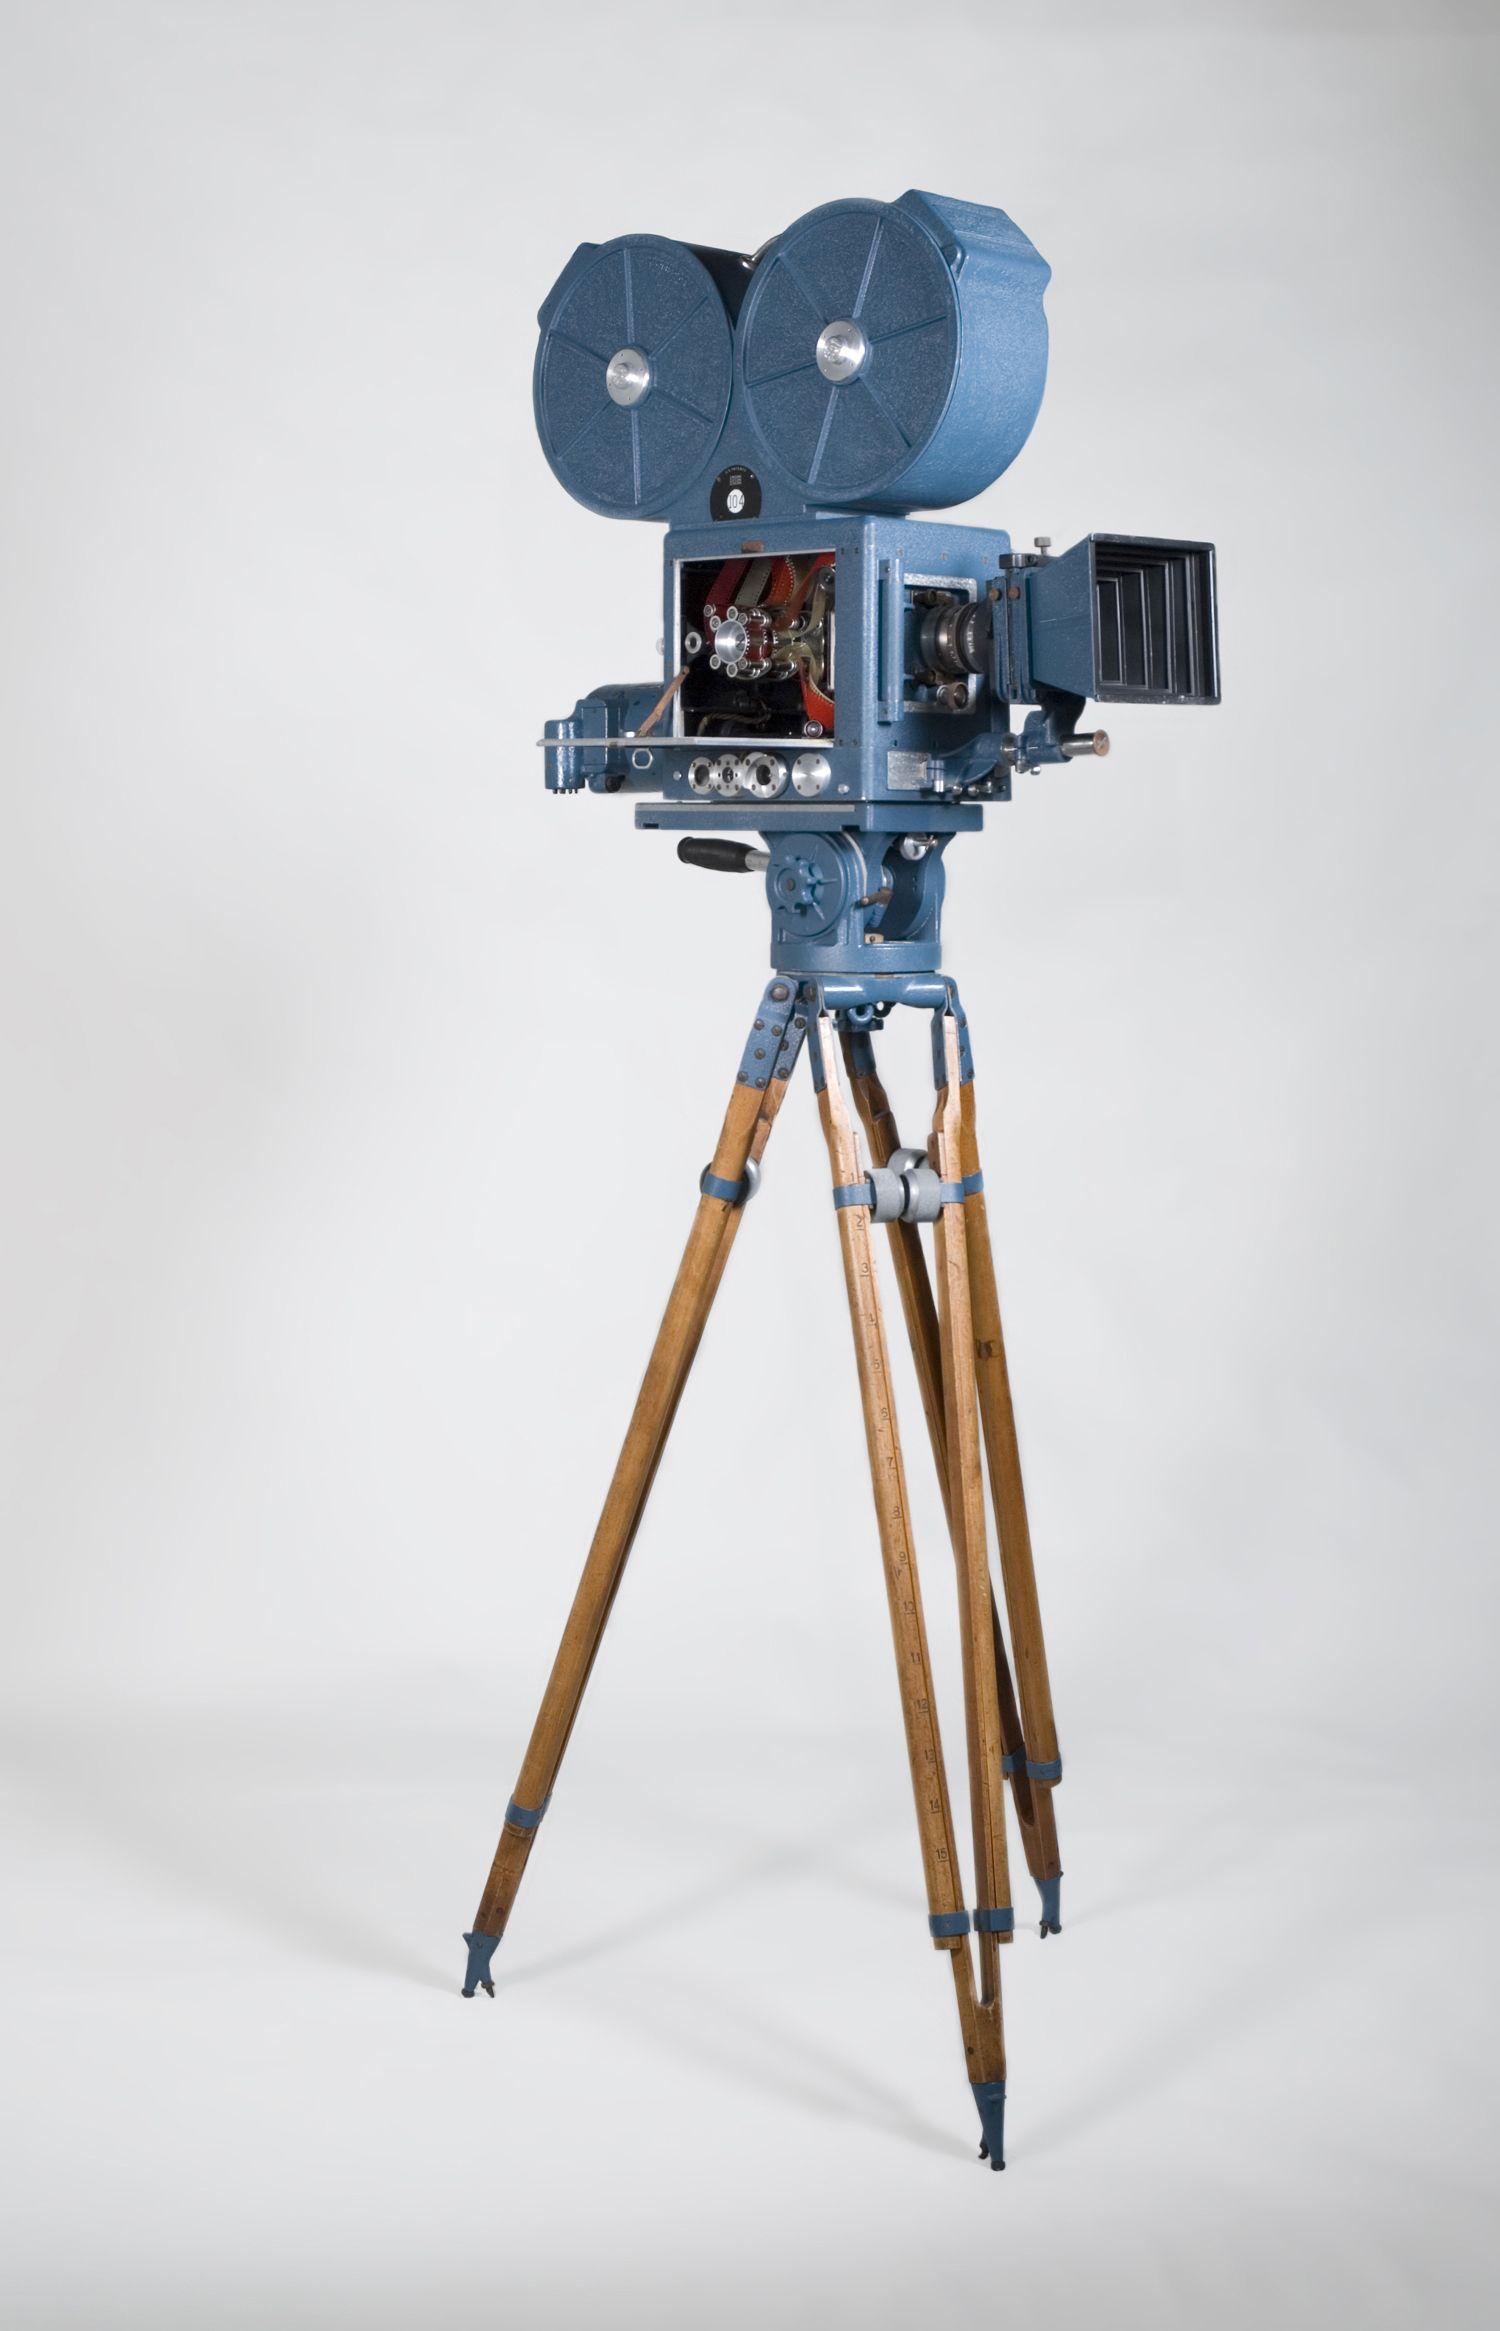 Technicolor Camera Jpg 1500 2331 Movie Camera Old Cameras Church Decor